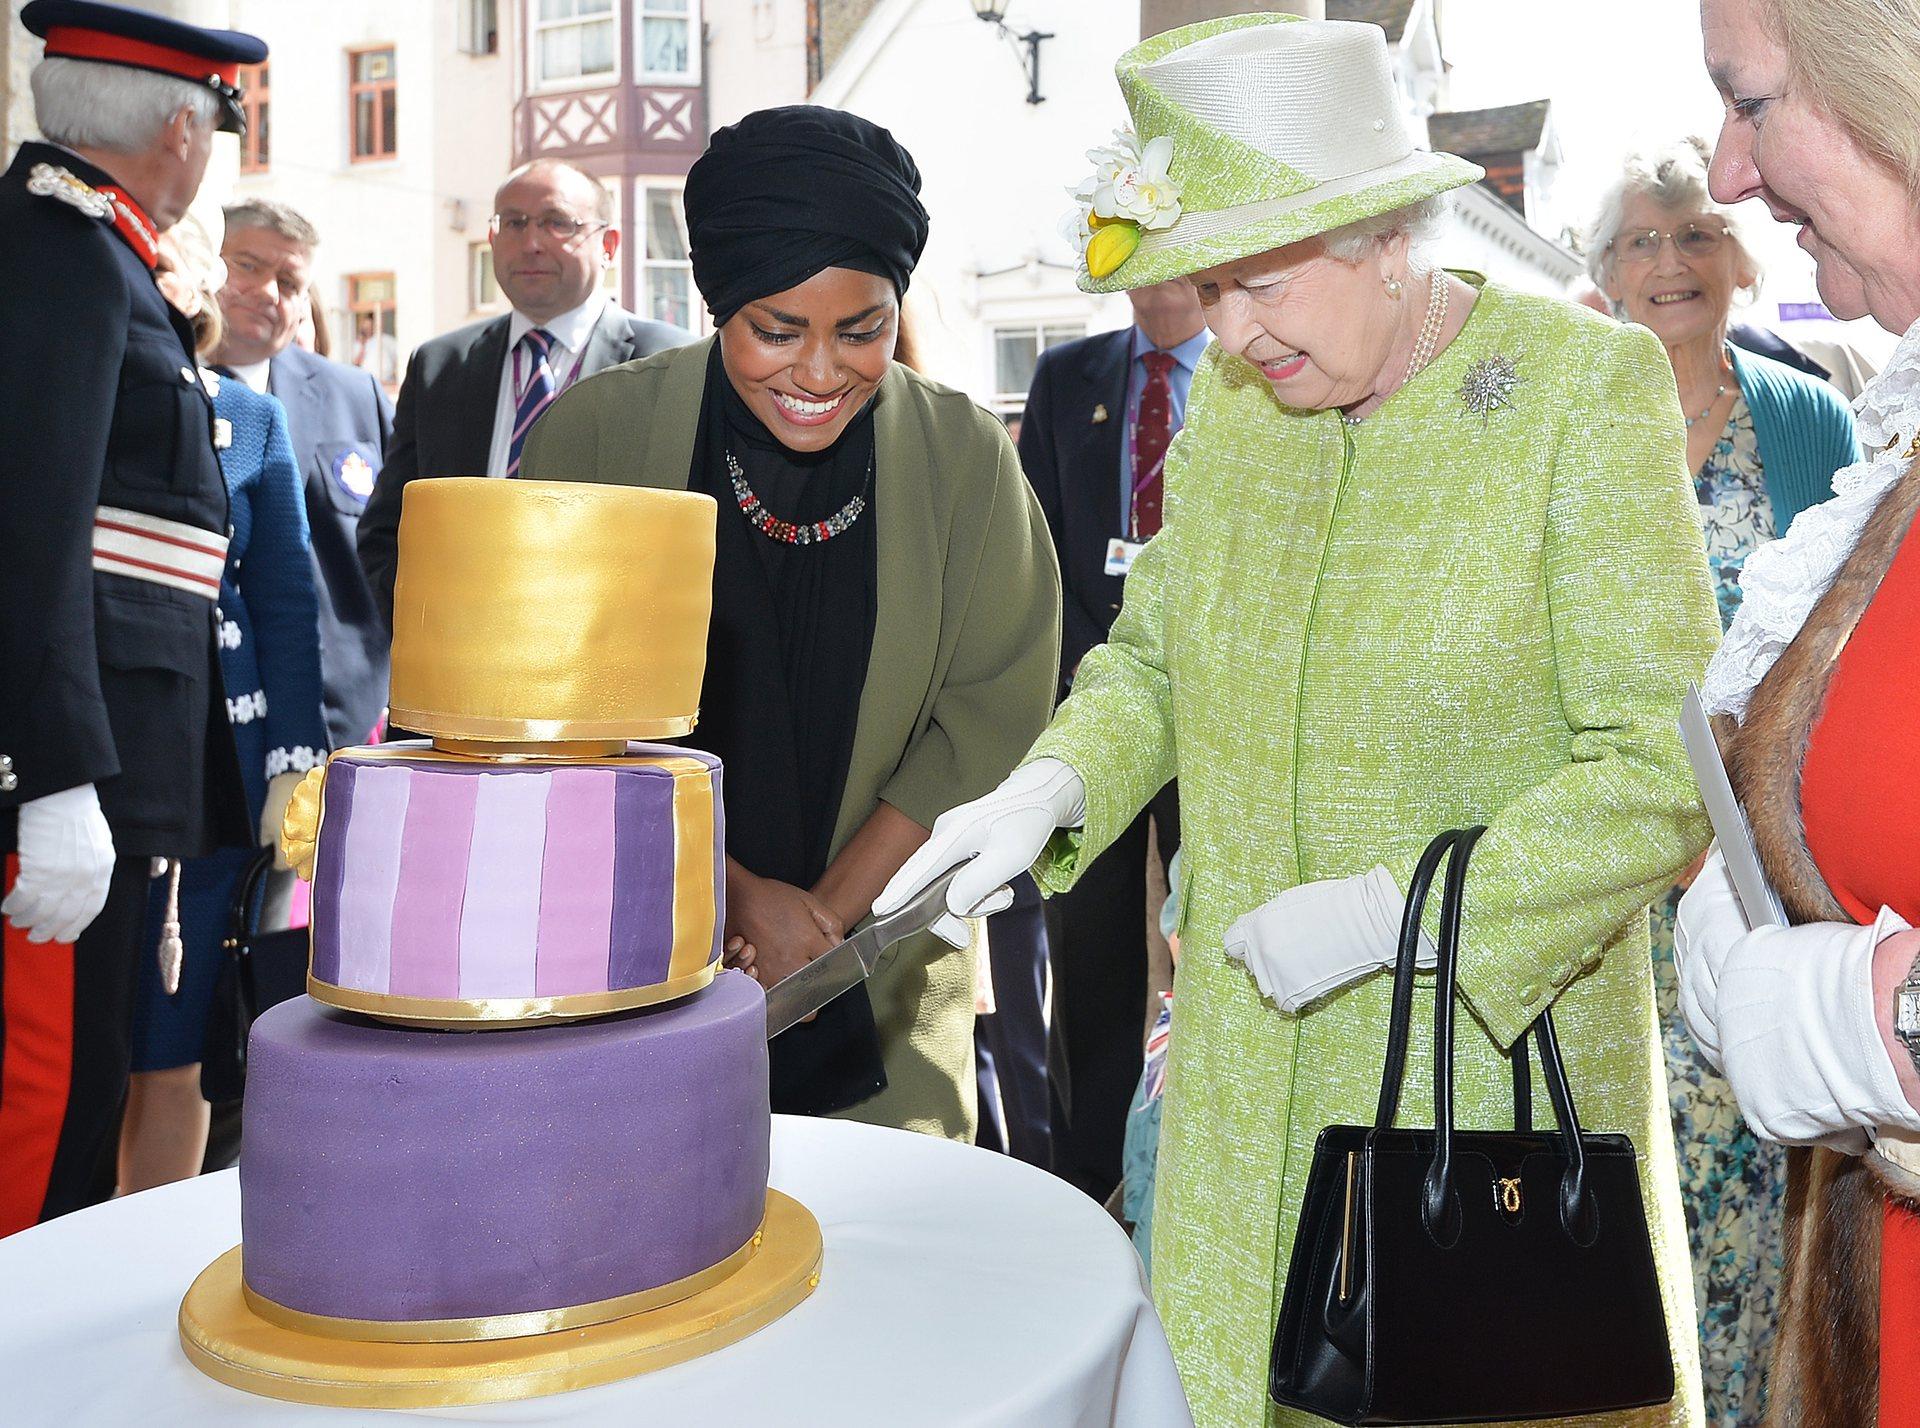 queen's 90th birthday windsor cake